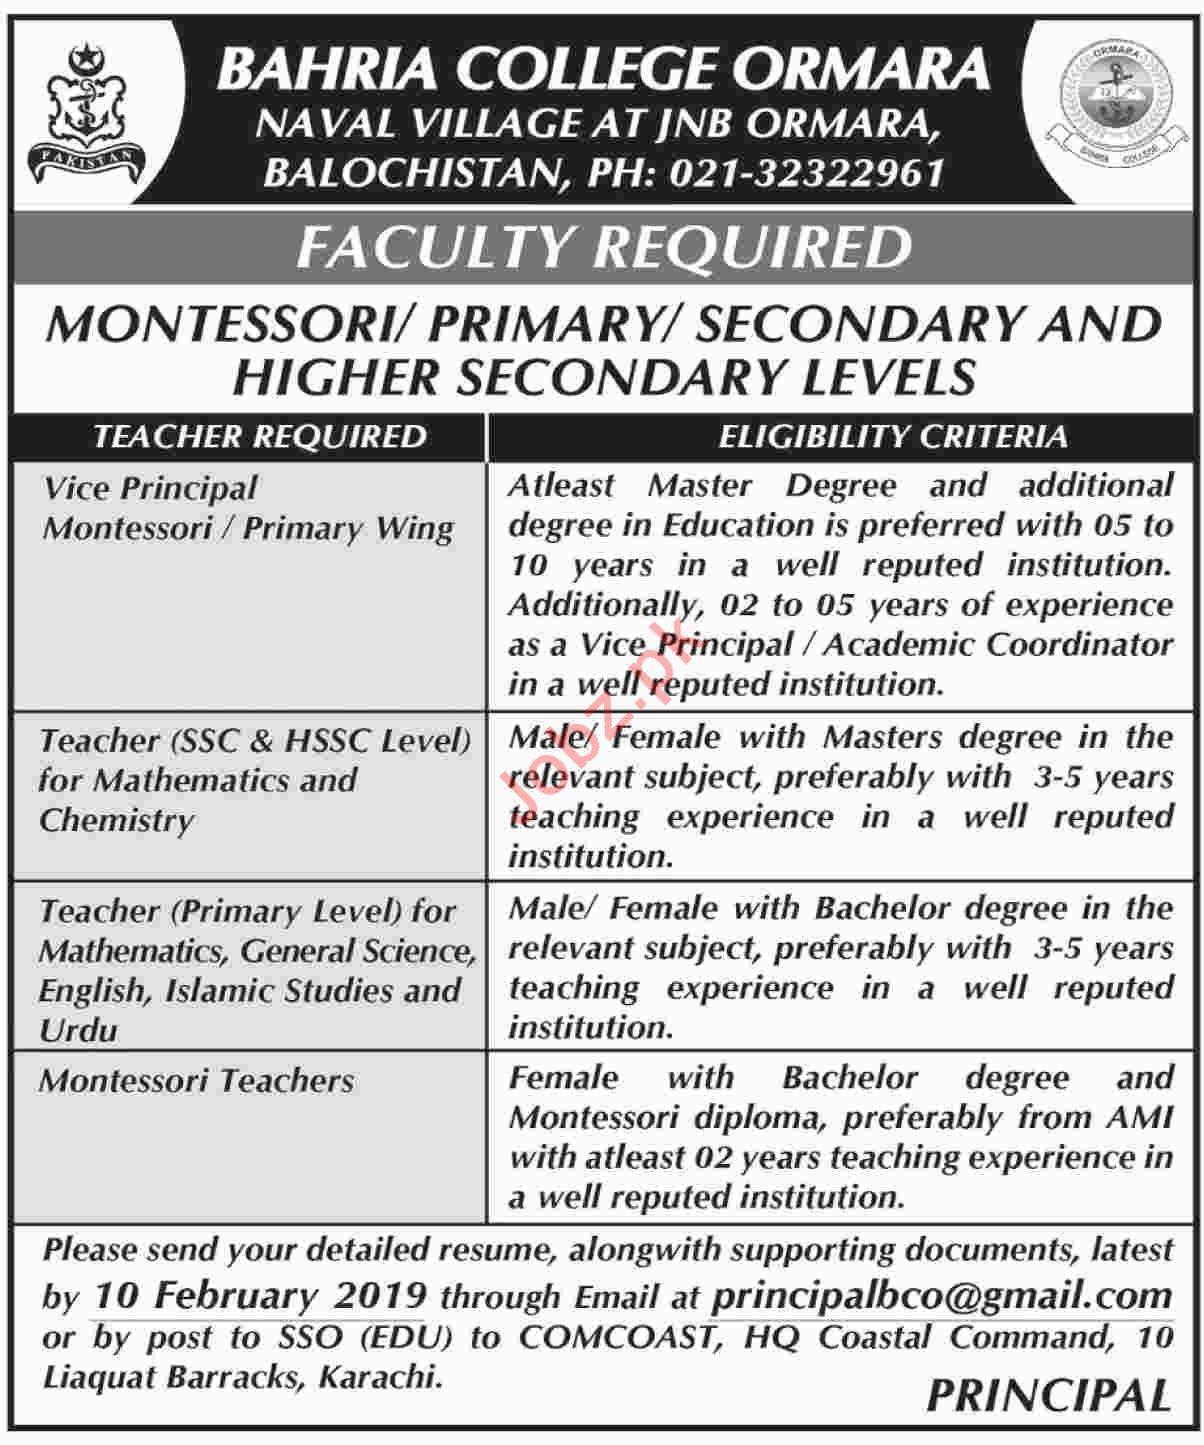 Montessori Teacher Jobs at Bahria College Ormara